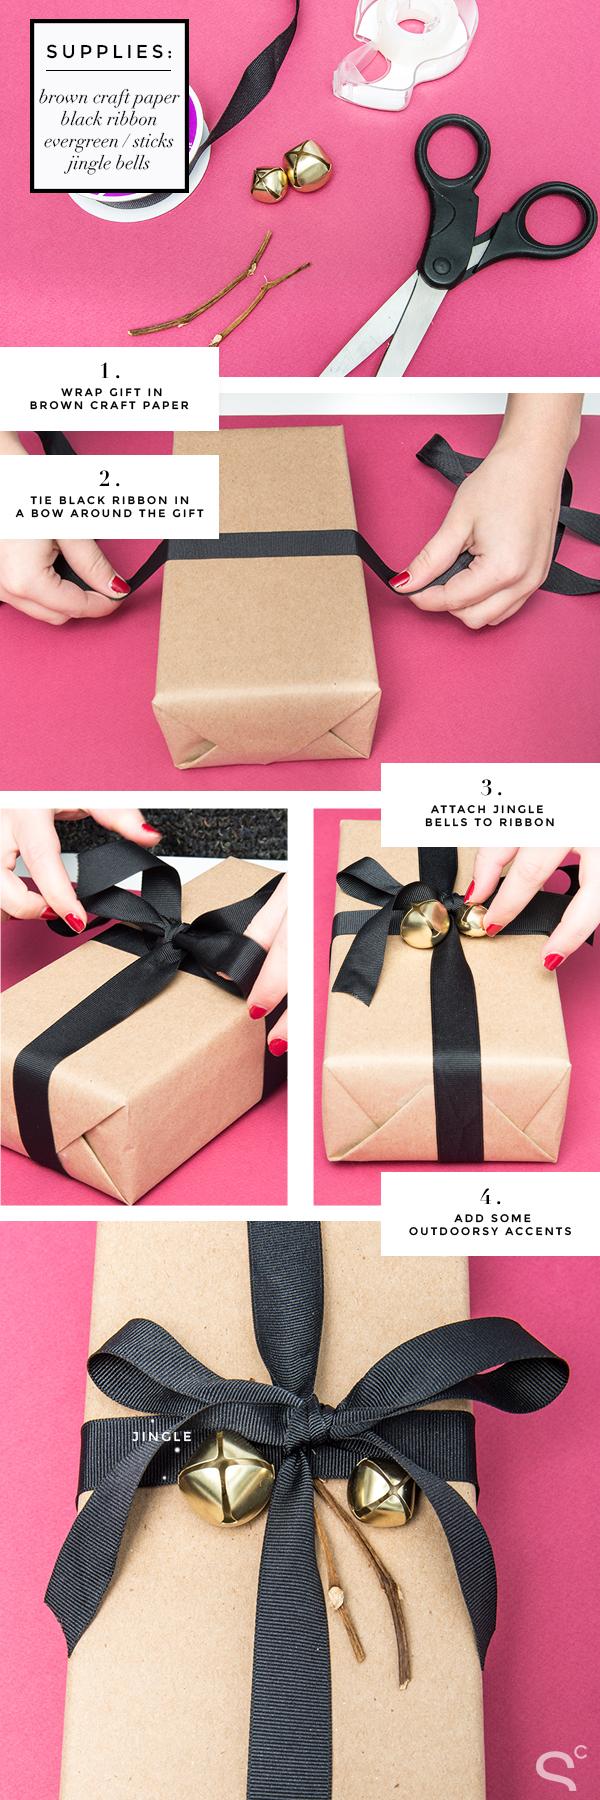 DIY-Gift-Wrapping-Ideas-Jingle-Bells